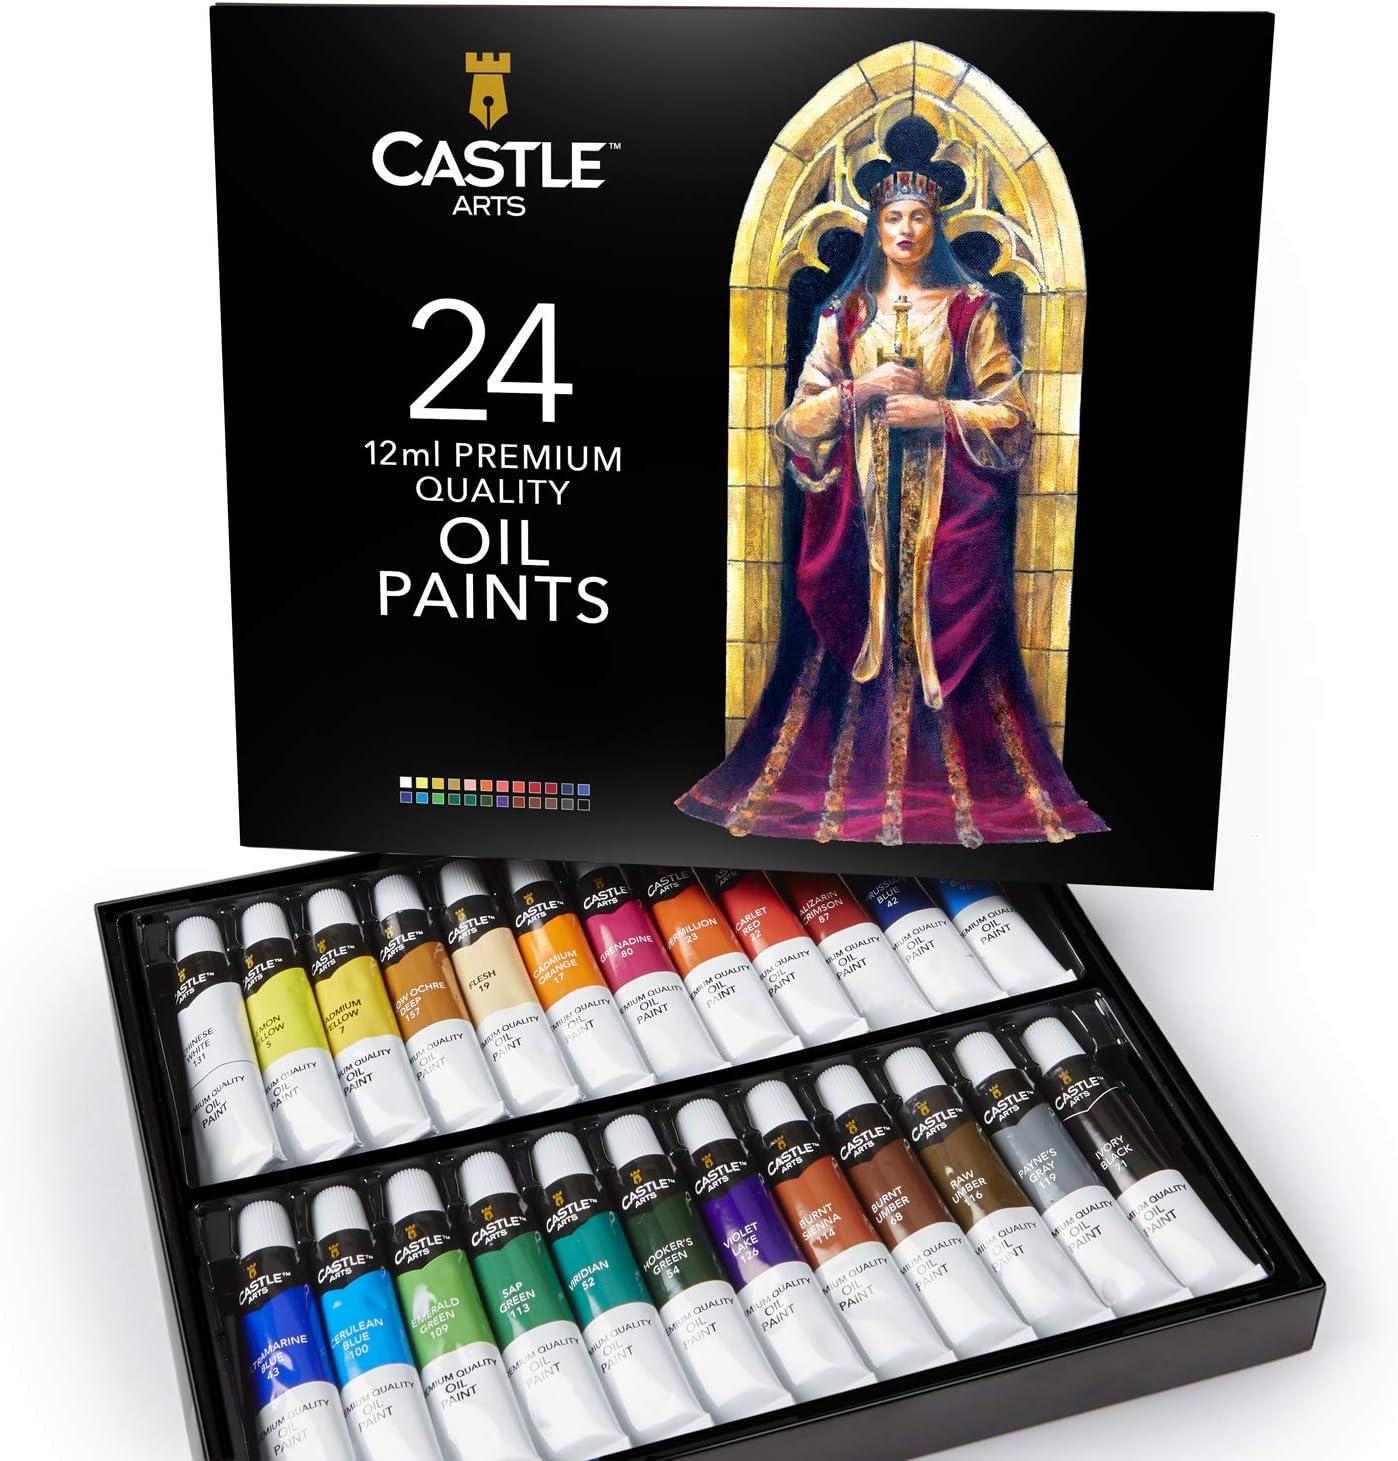 Castle Art Supplies juego de pinturas al óleo para artistas o principiantes, 24 colores vivos al óleo. Estuche de pintura profesional